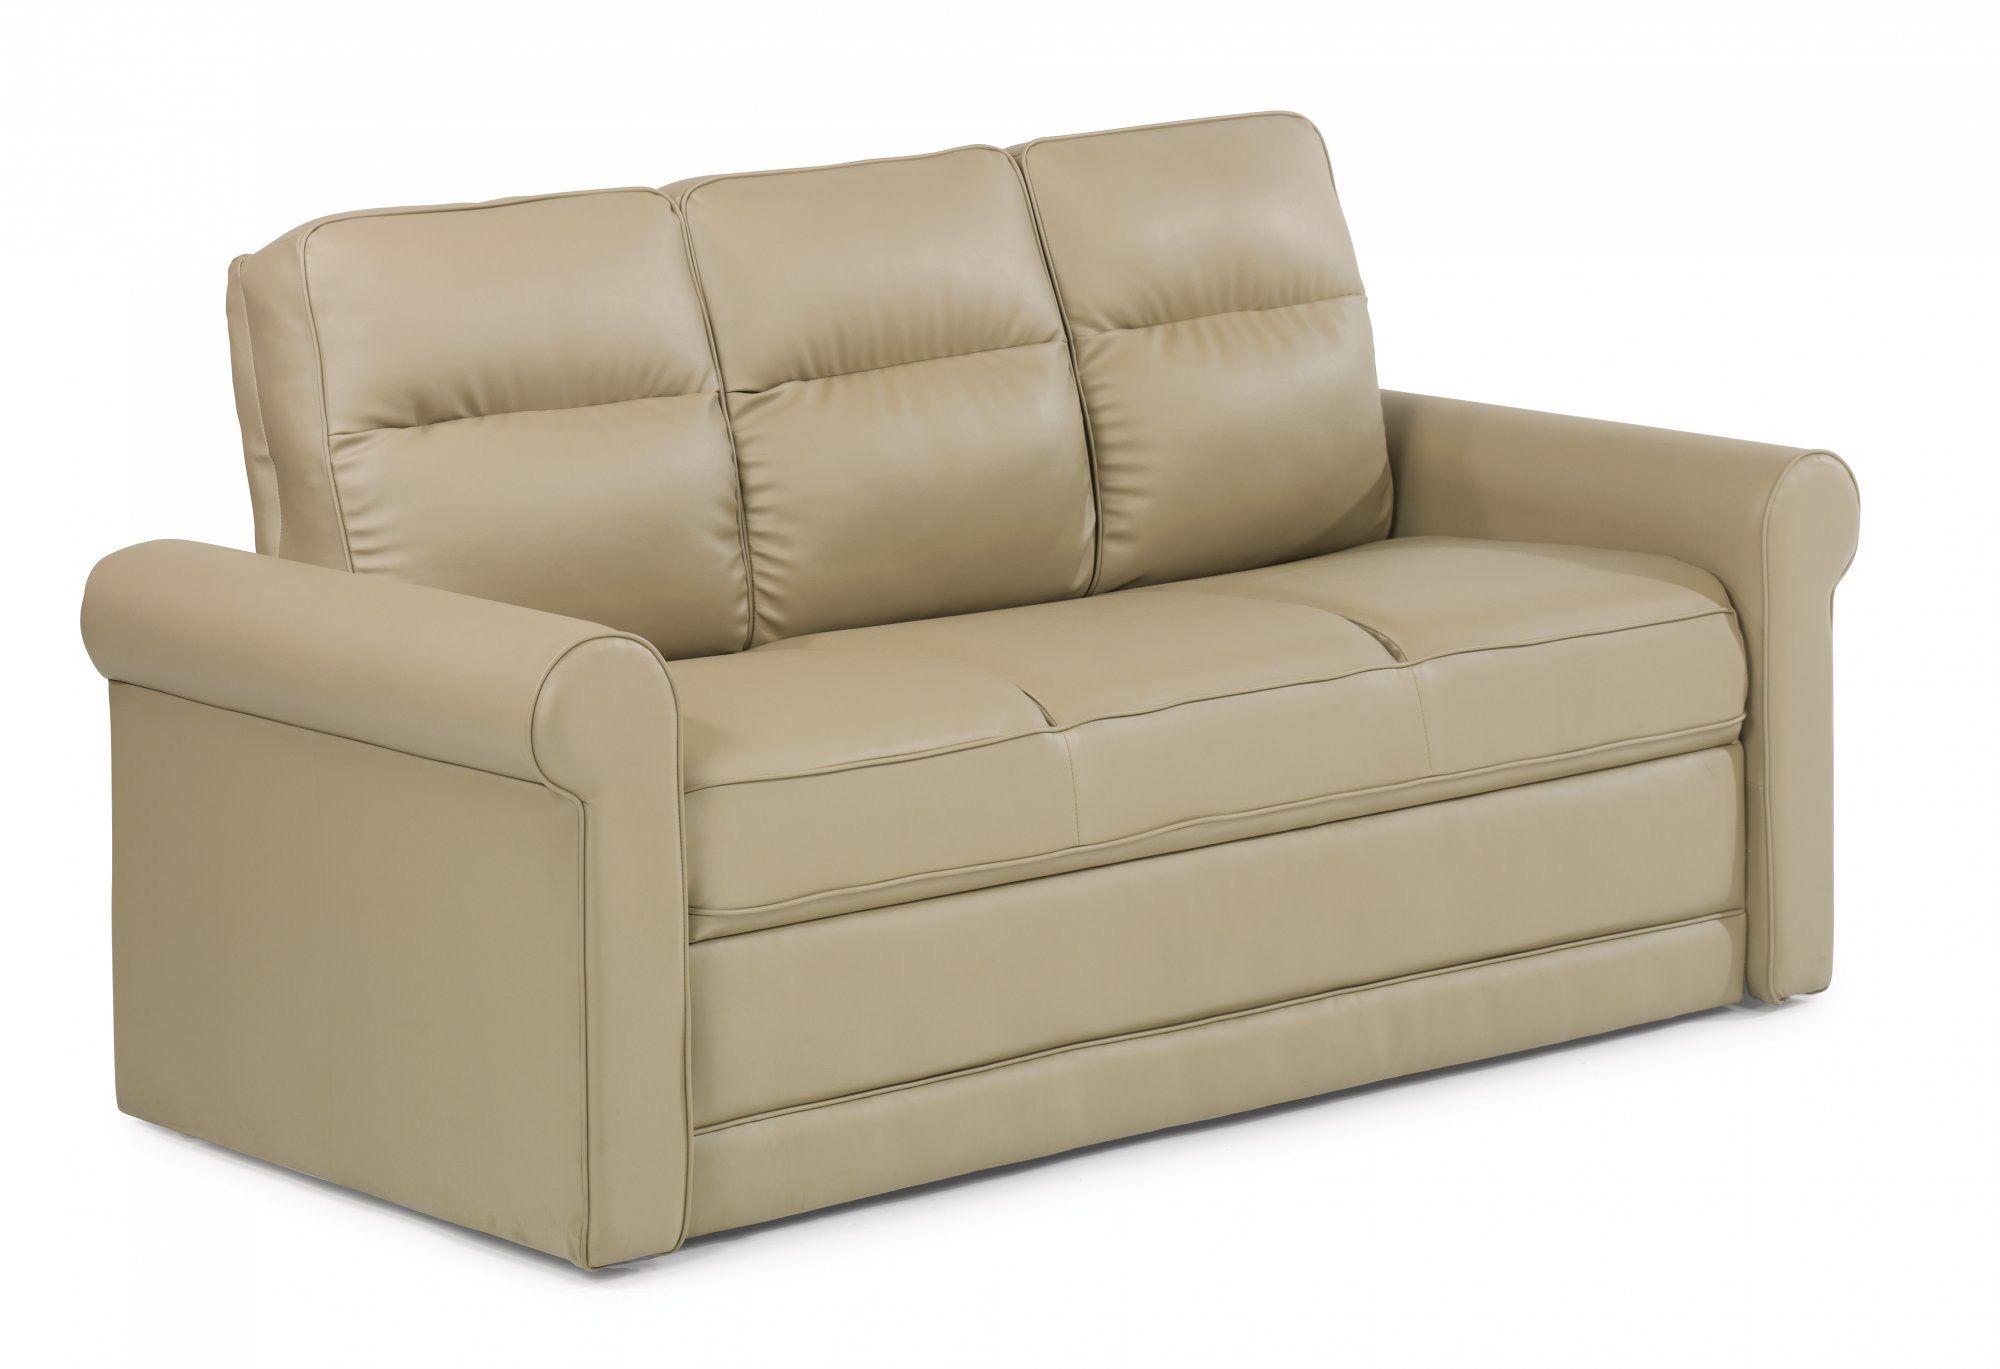 Cool Inspirational Air Mattress Sofa Bed 68 On Home Decor Ideas With Air  Mattress Sofa Bed